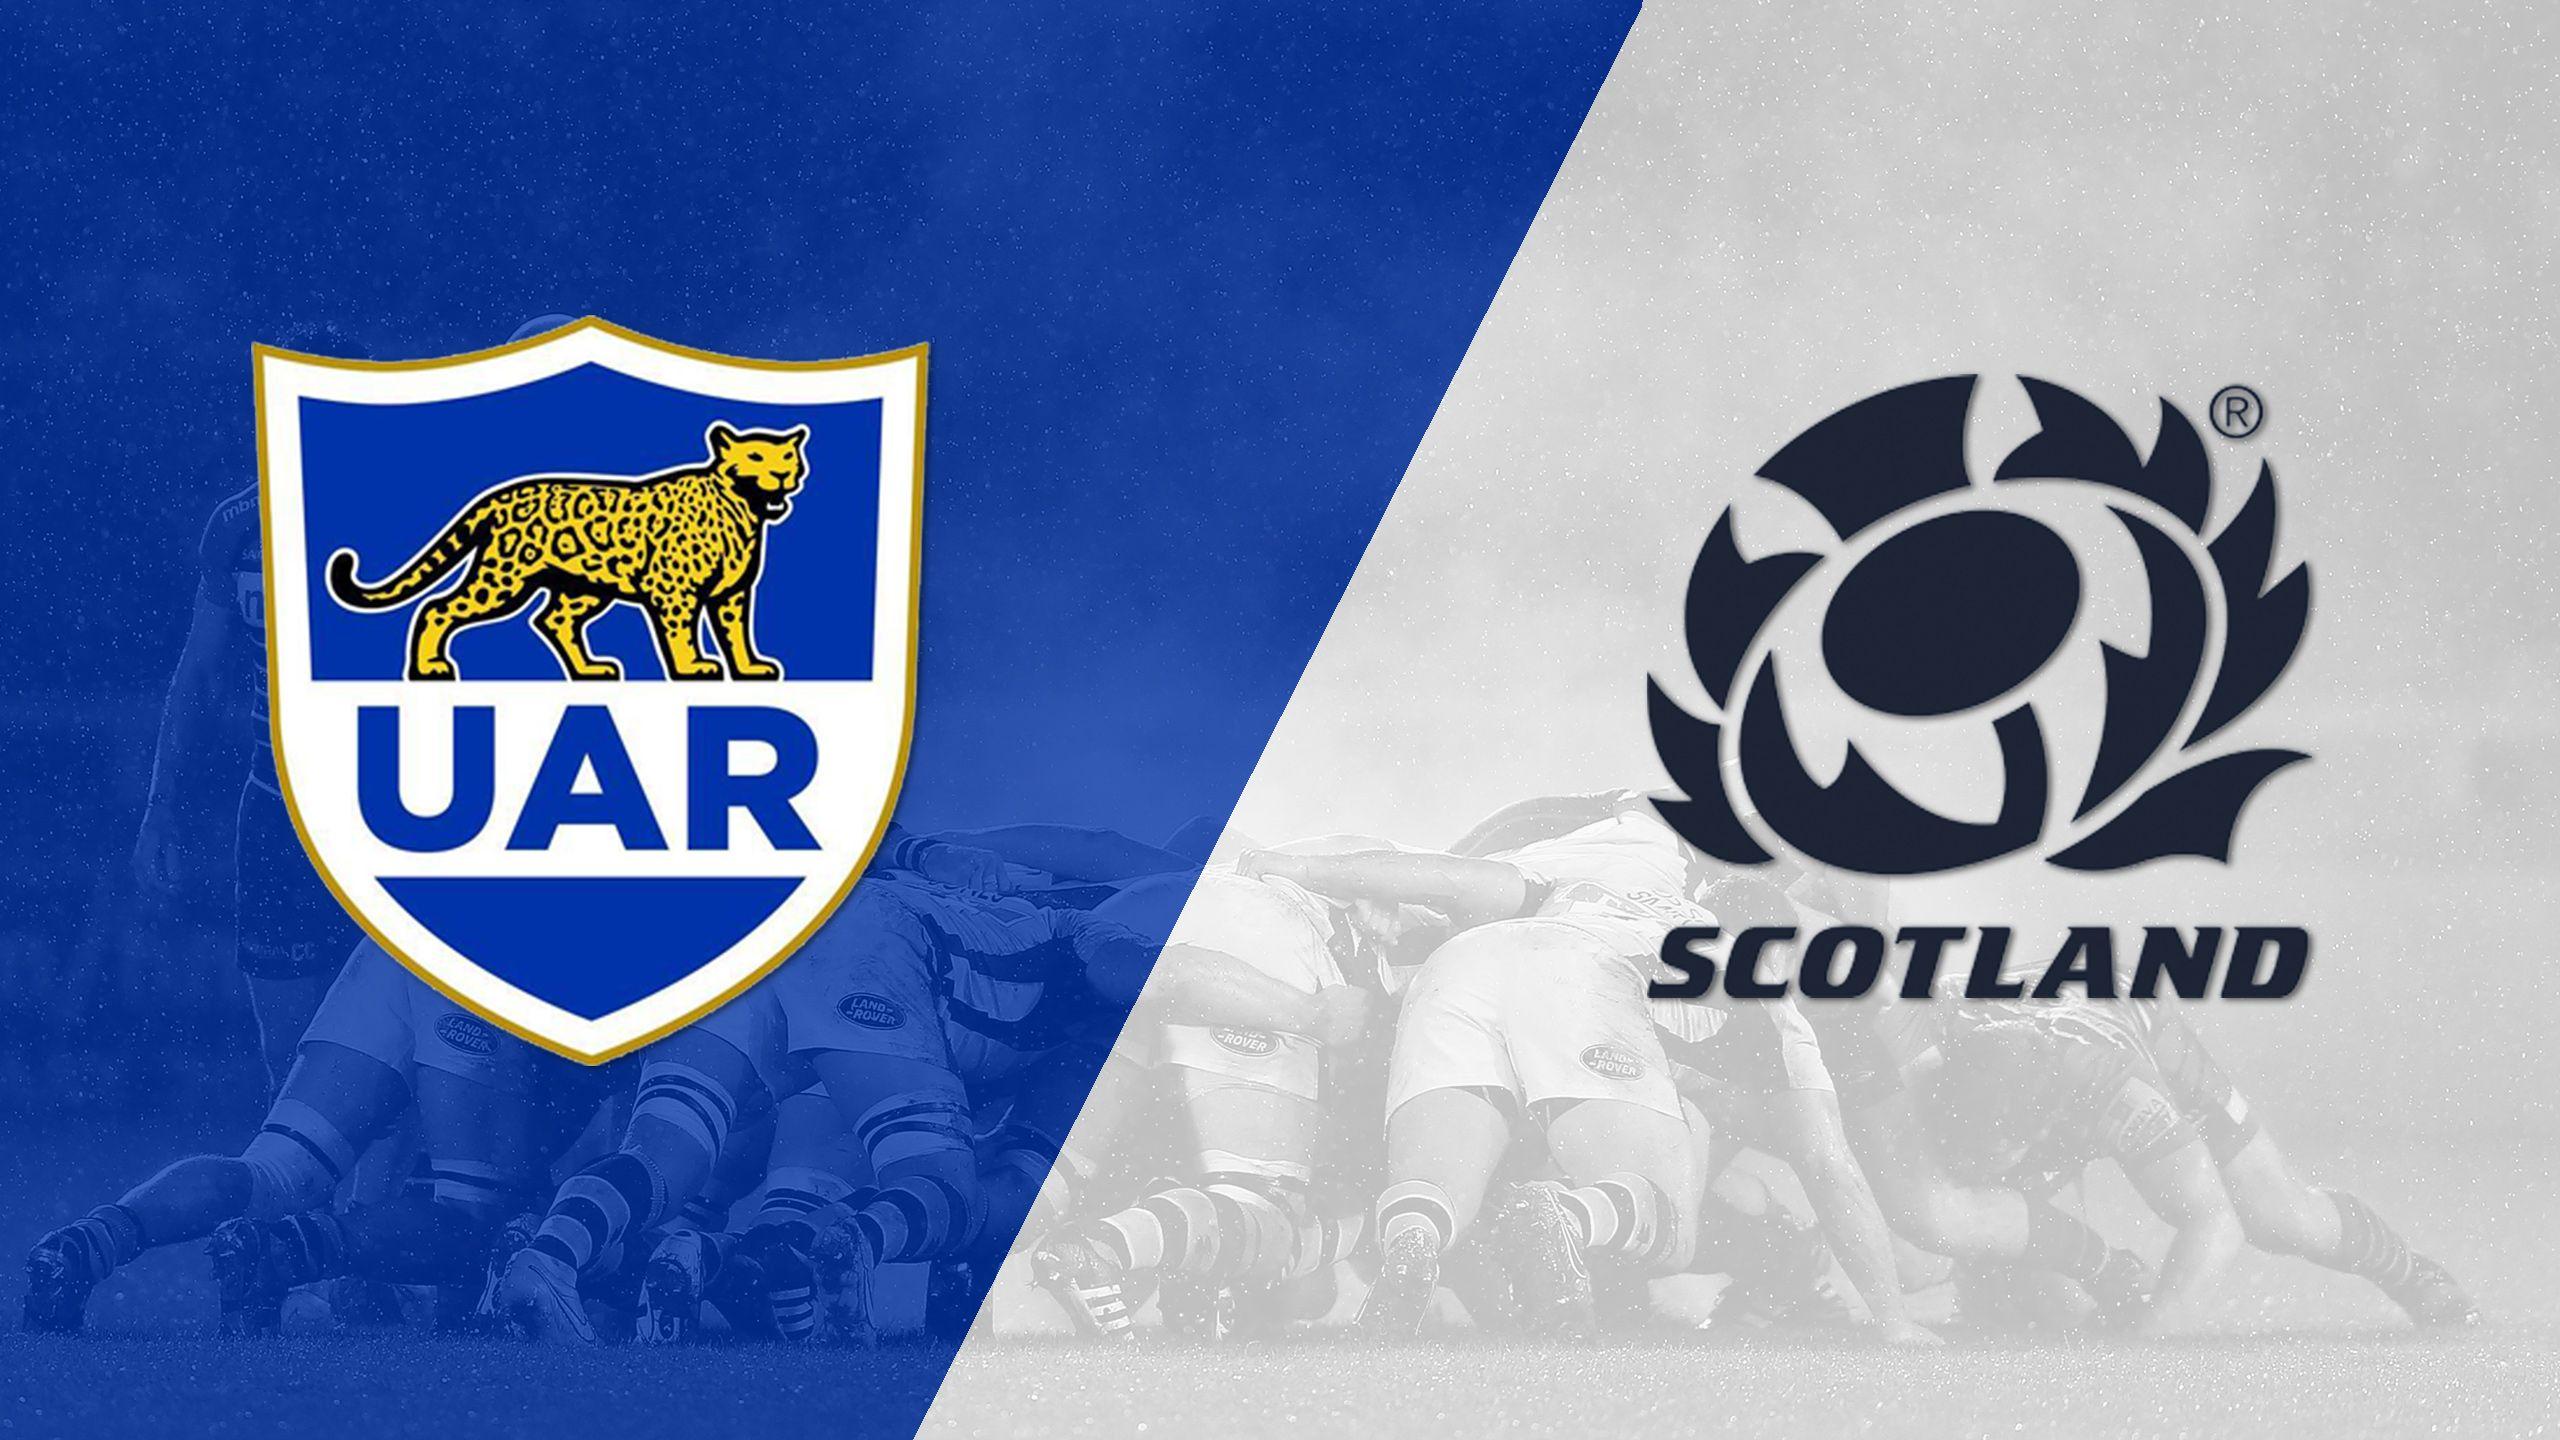 Argentina vs. Scotland (World Rugby Sevens Series)